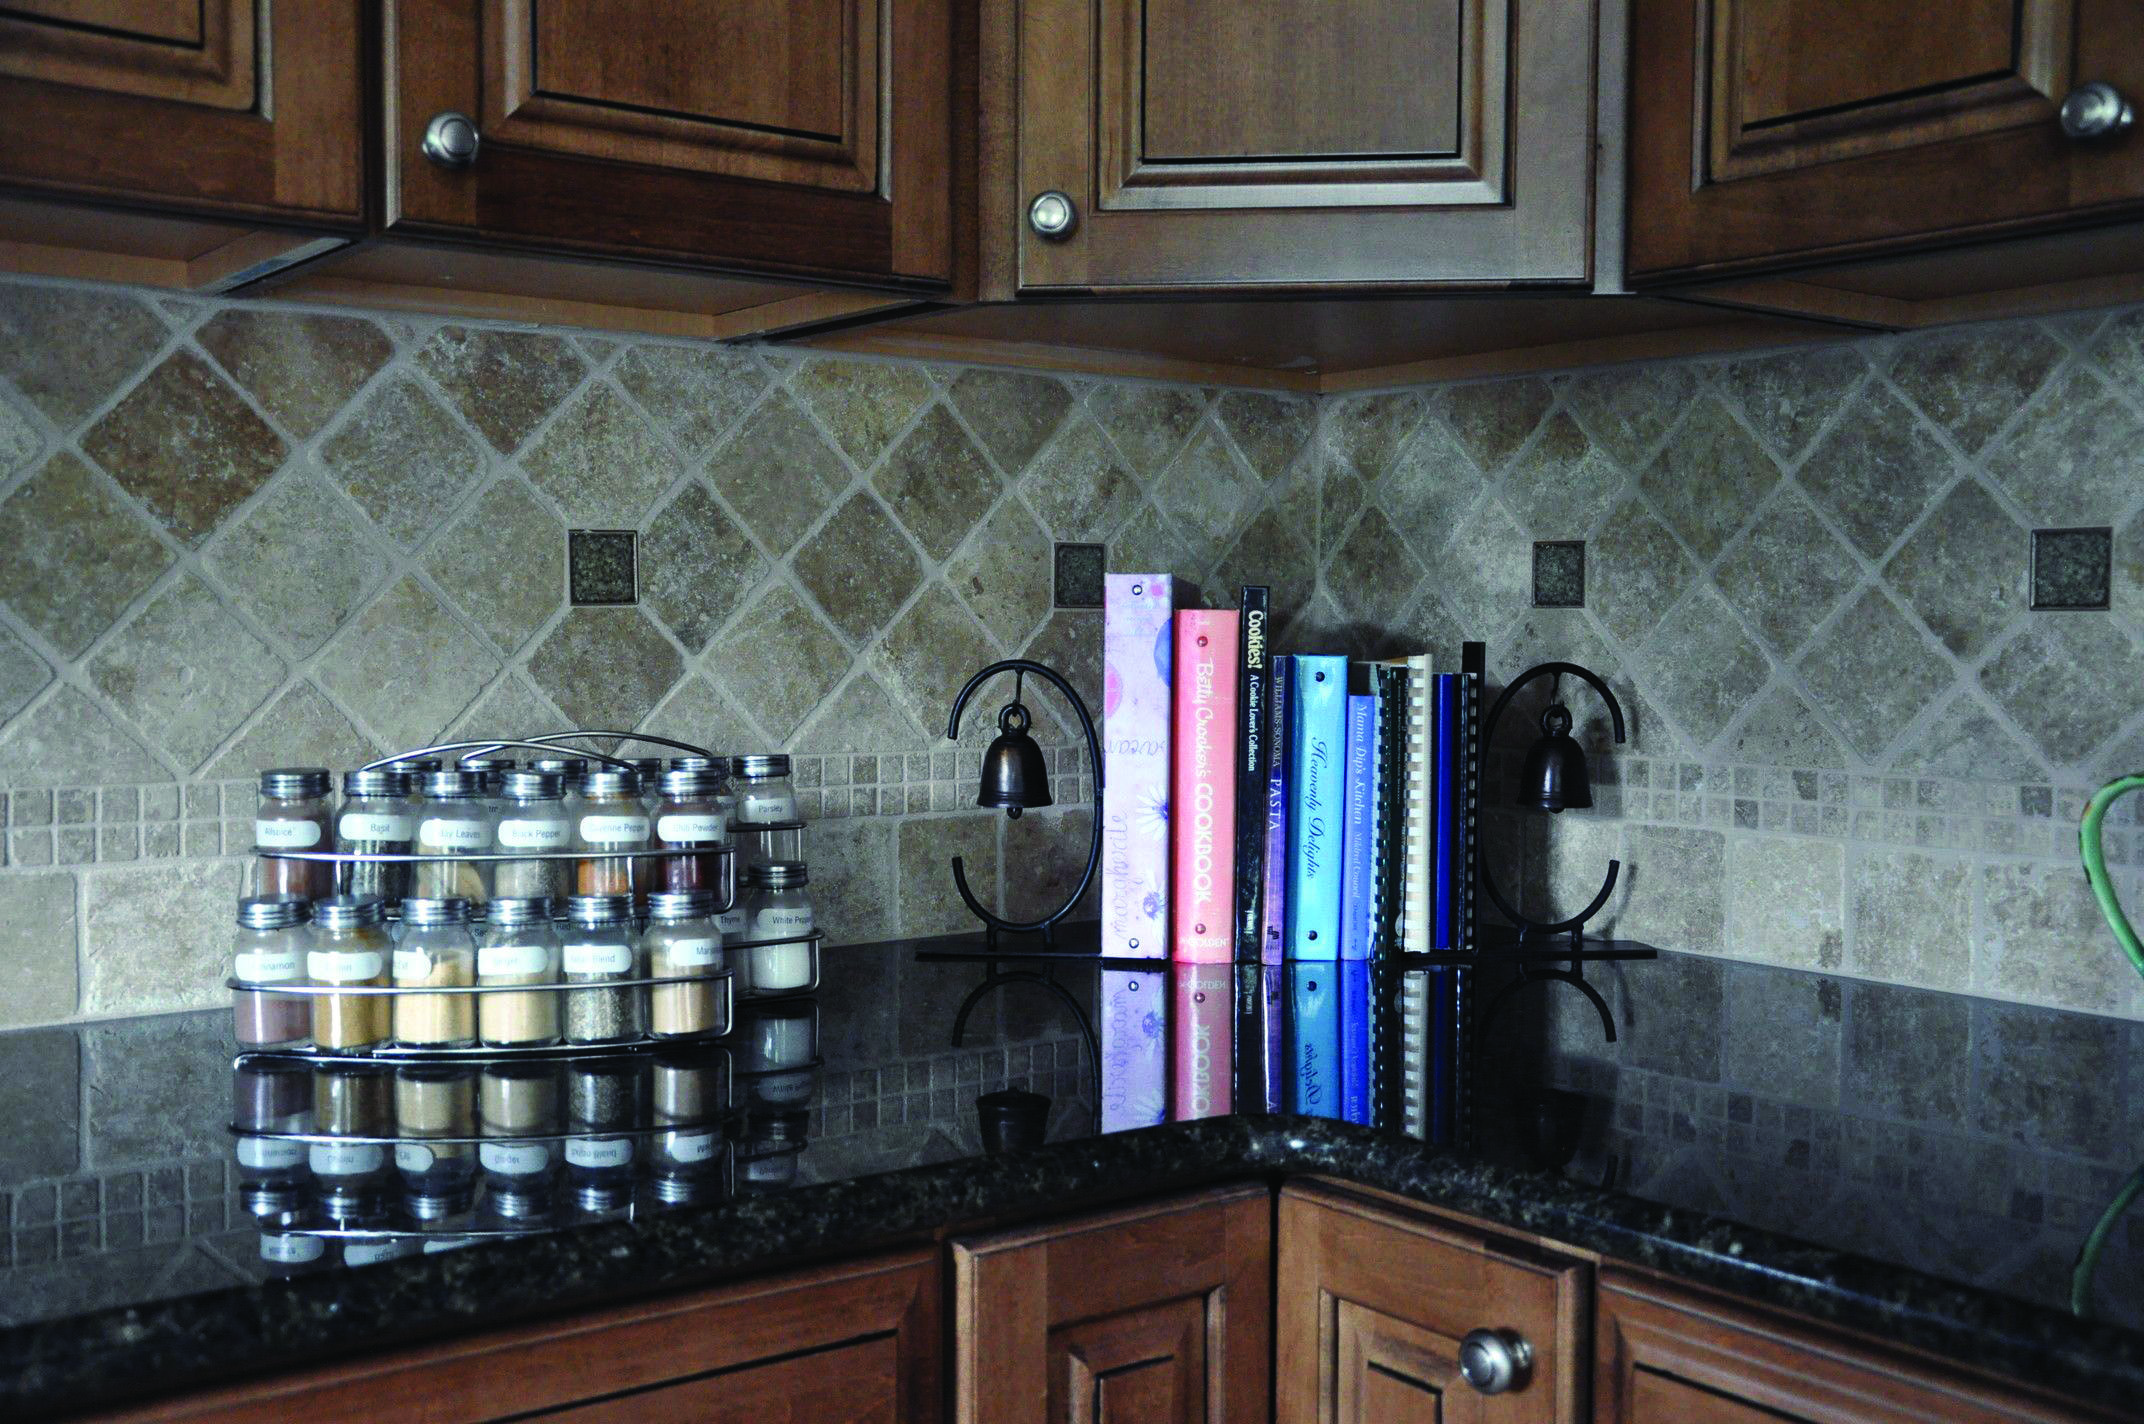 Dark Marble Countertops Colors Styles Black Granite Countertops Trendy Kitchen Backsplash Granite Countertops